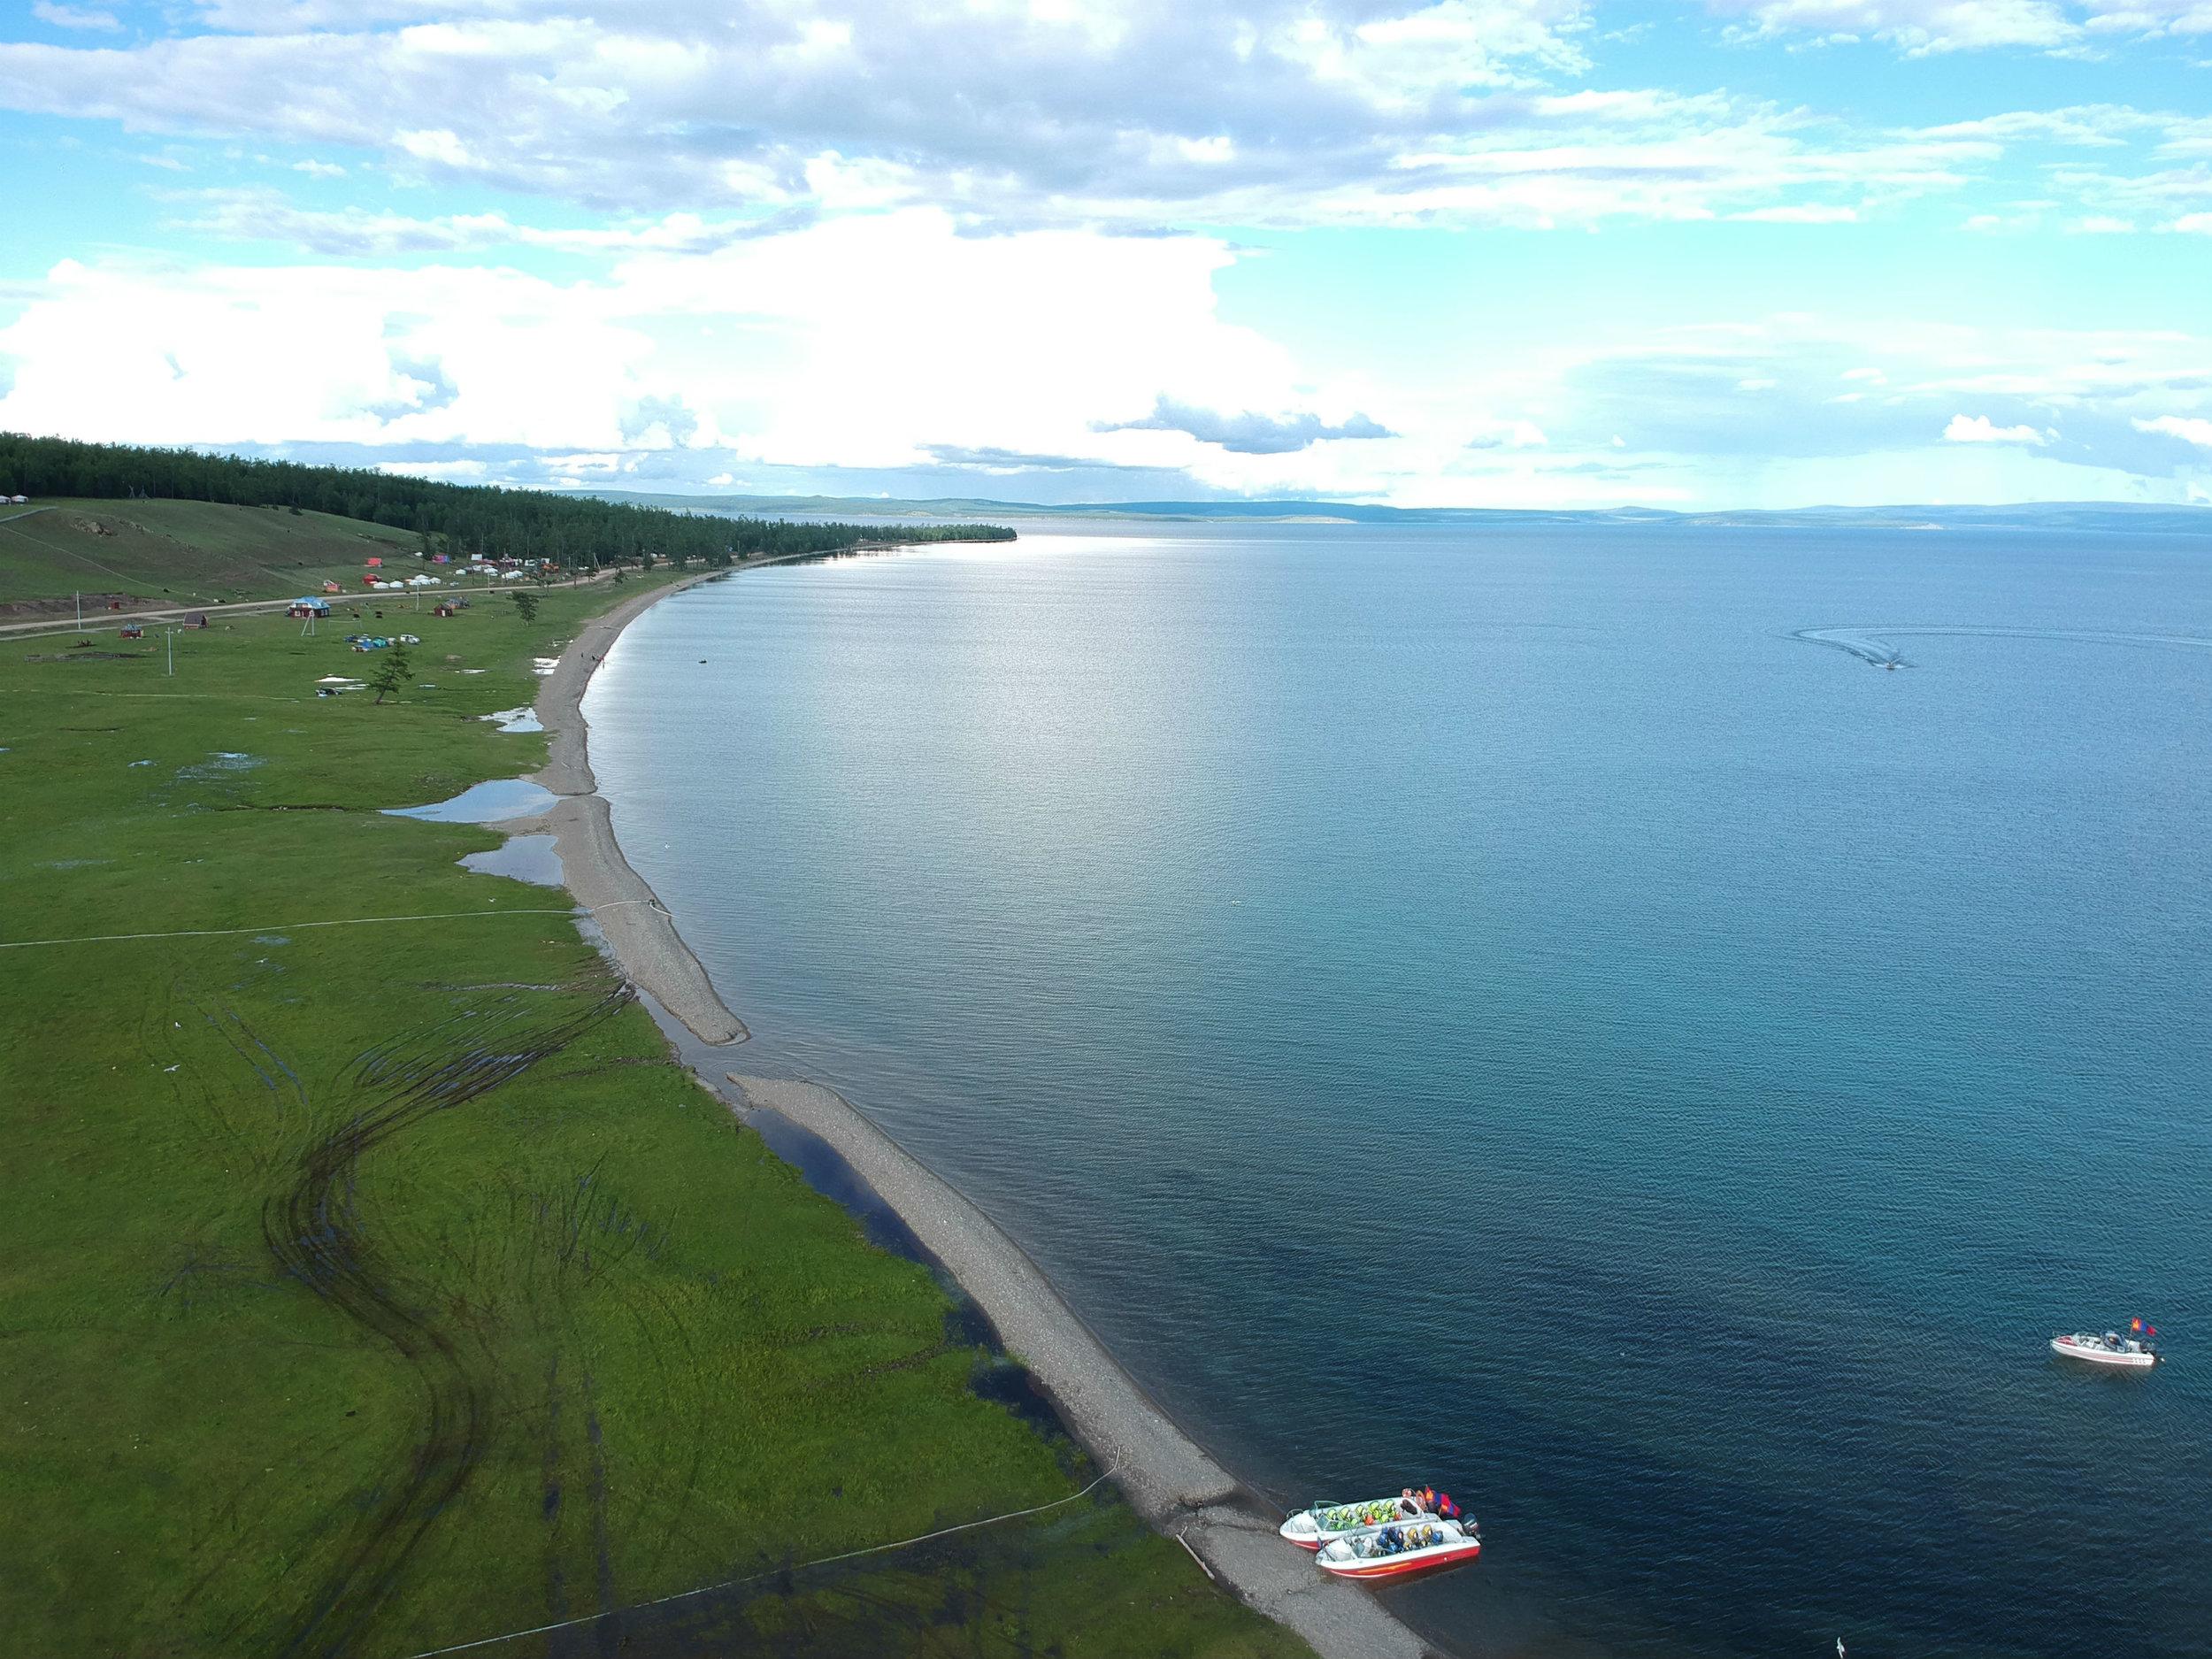 Khuvsgul Lake 250 km from the Russian border